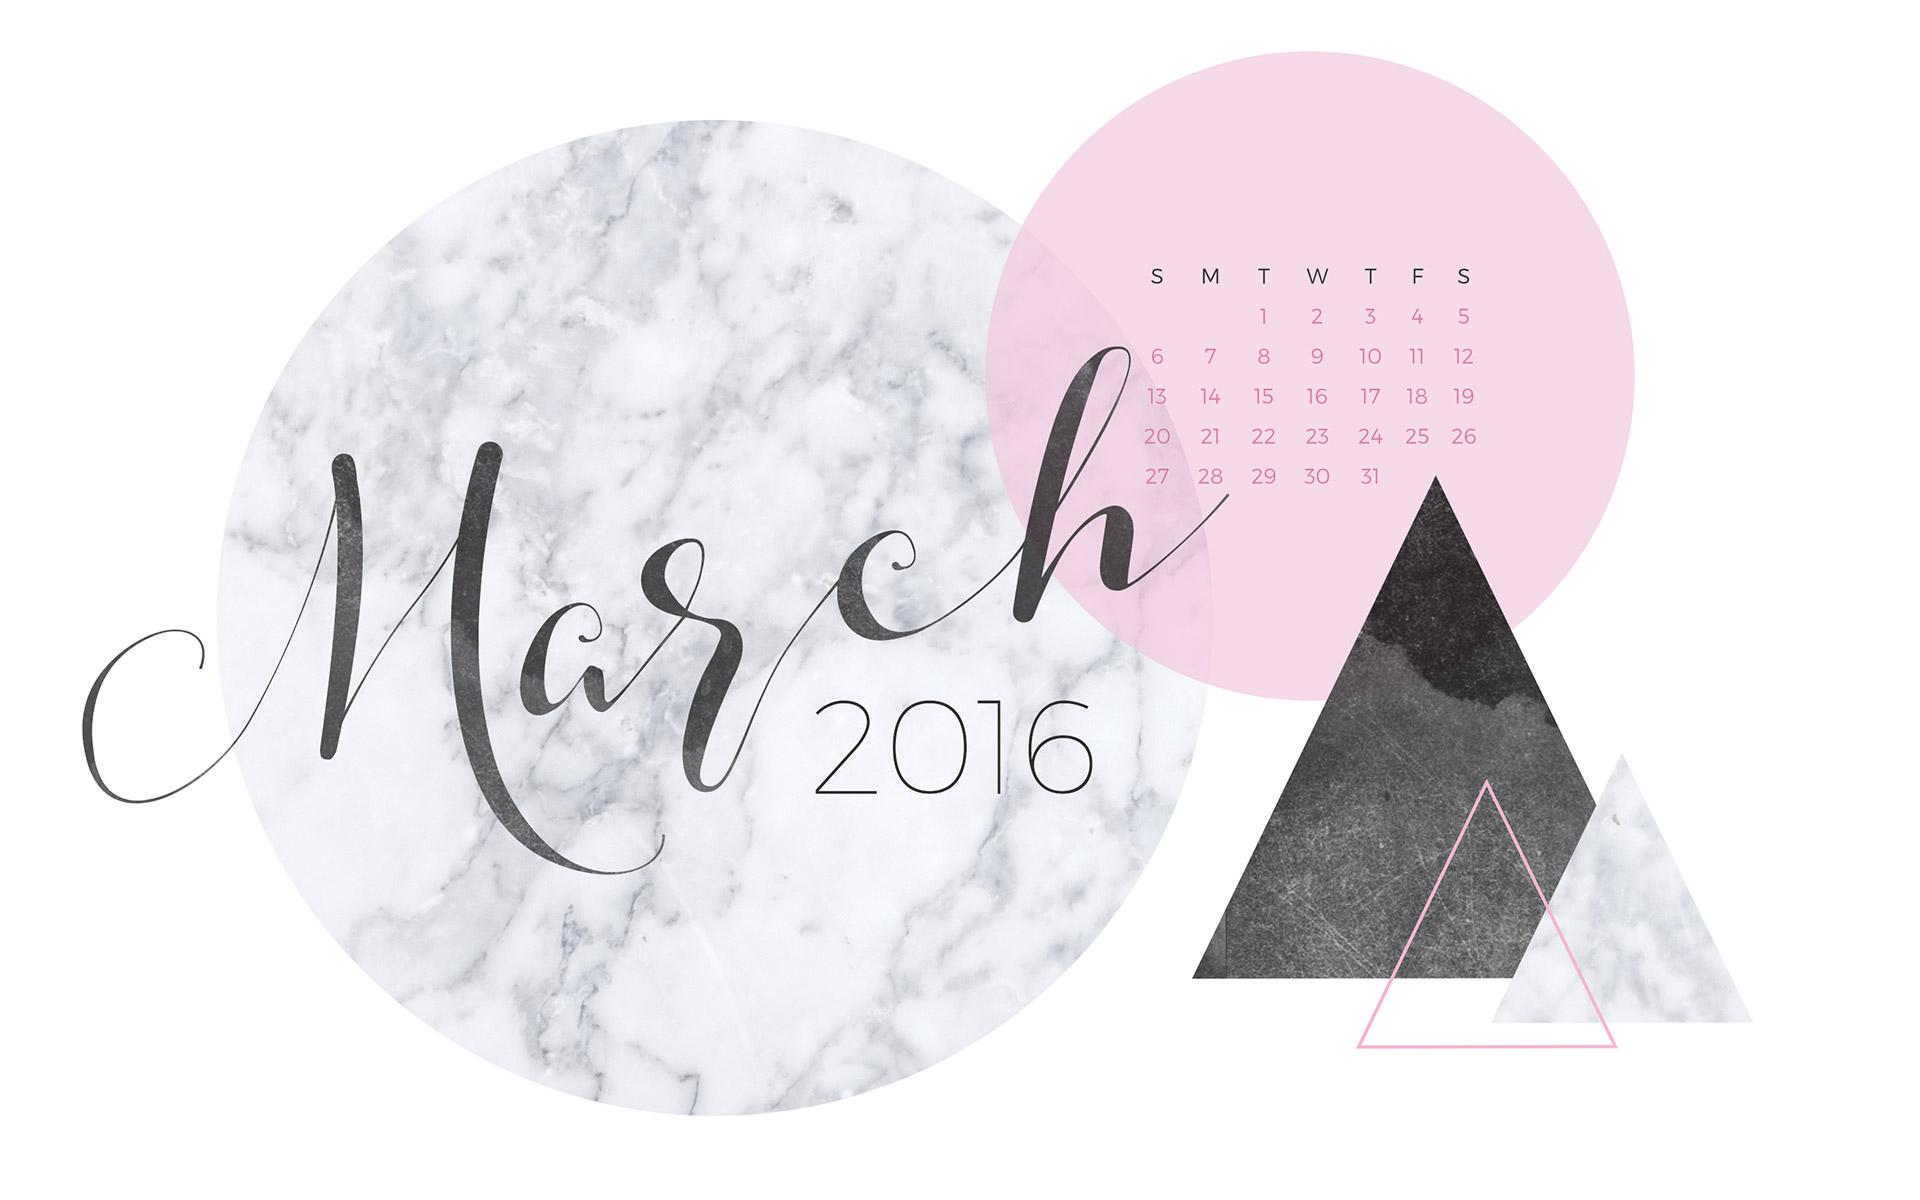 March 2016 Desktop Calendar Wallpaper Paper Leaf 1920x1200